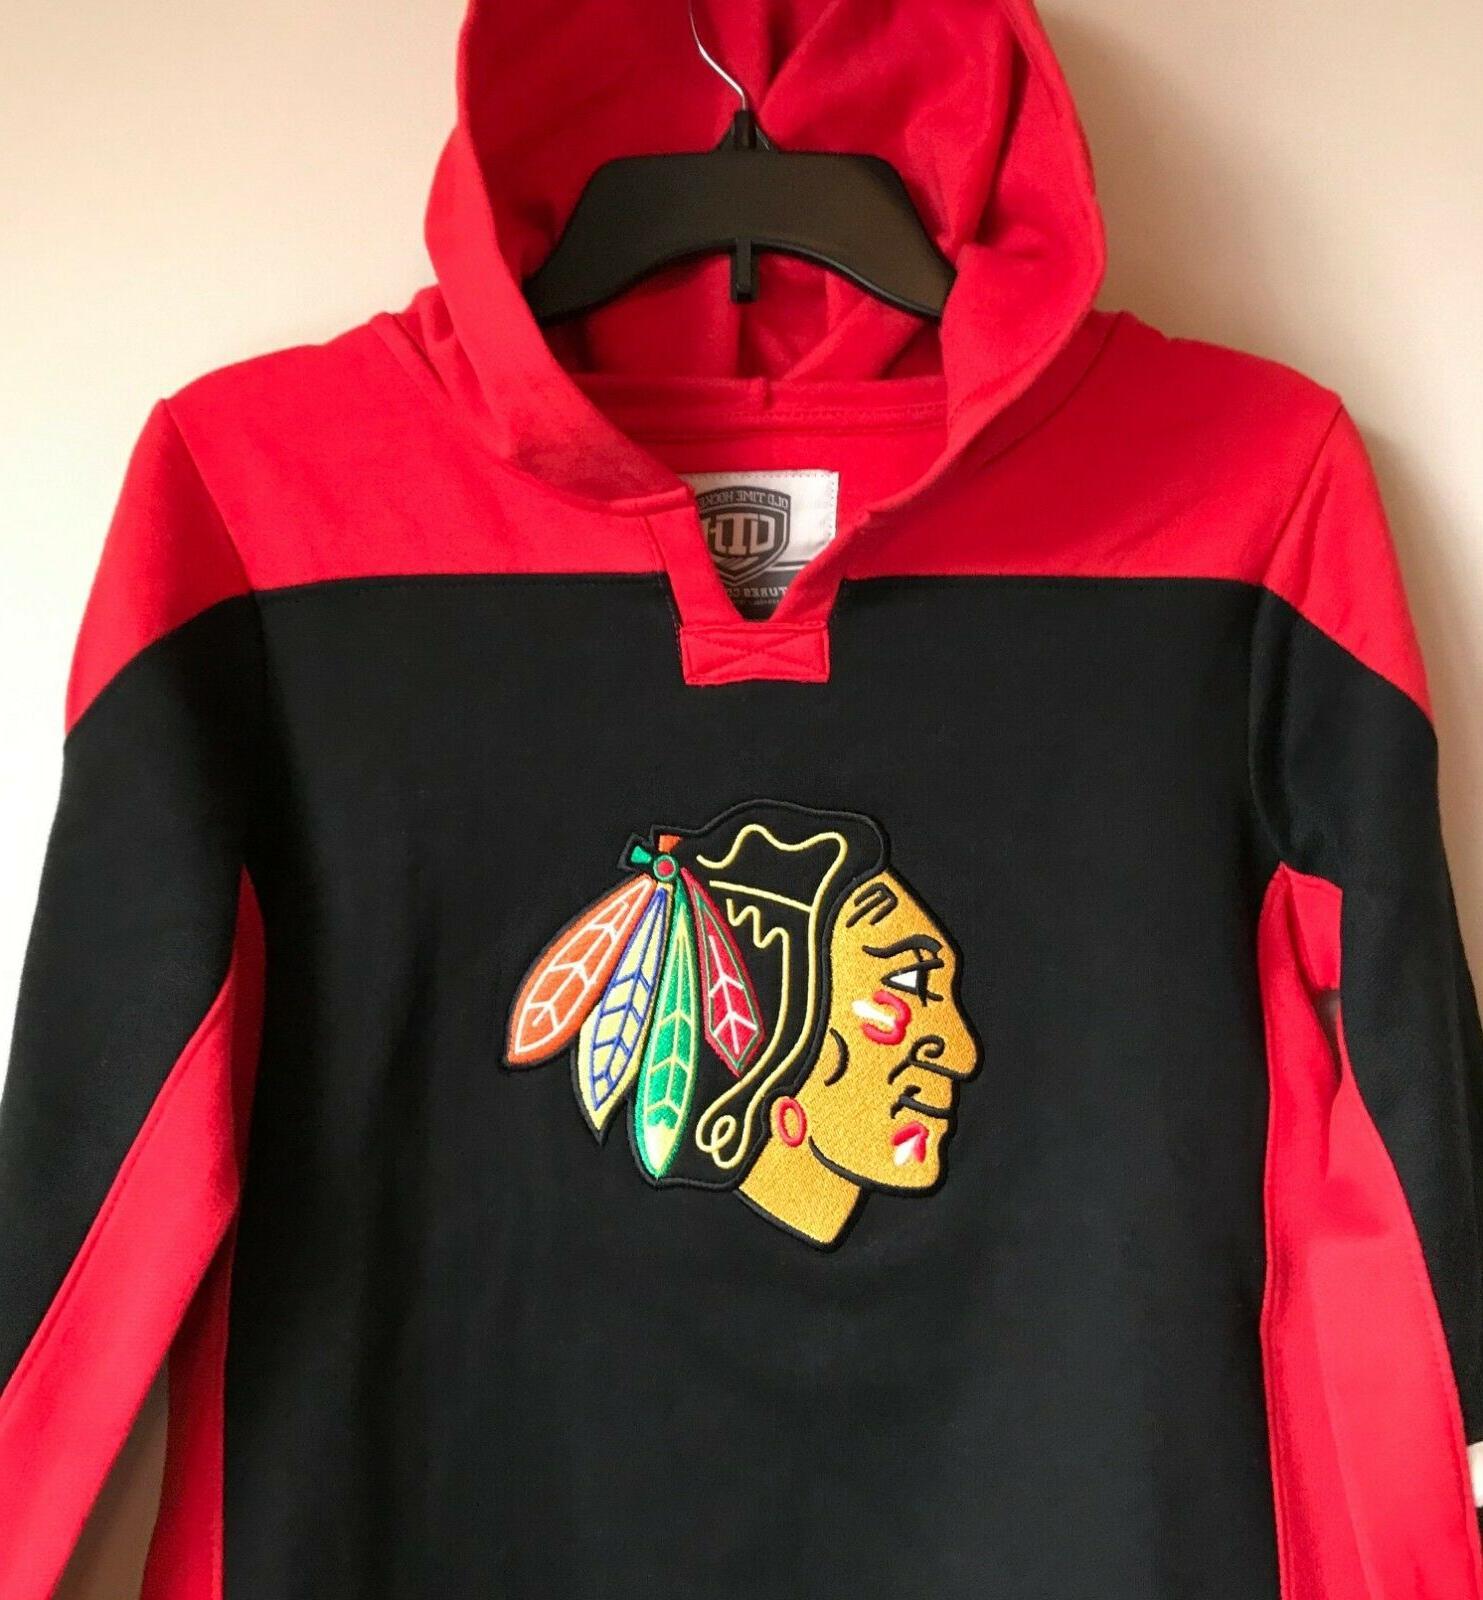 New Chicago Hoodie Hooded Sweatshirt Boys